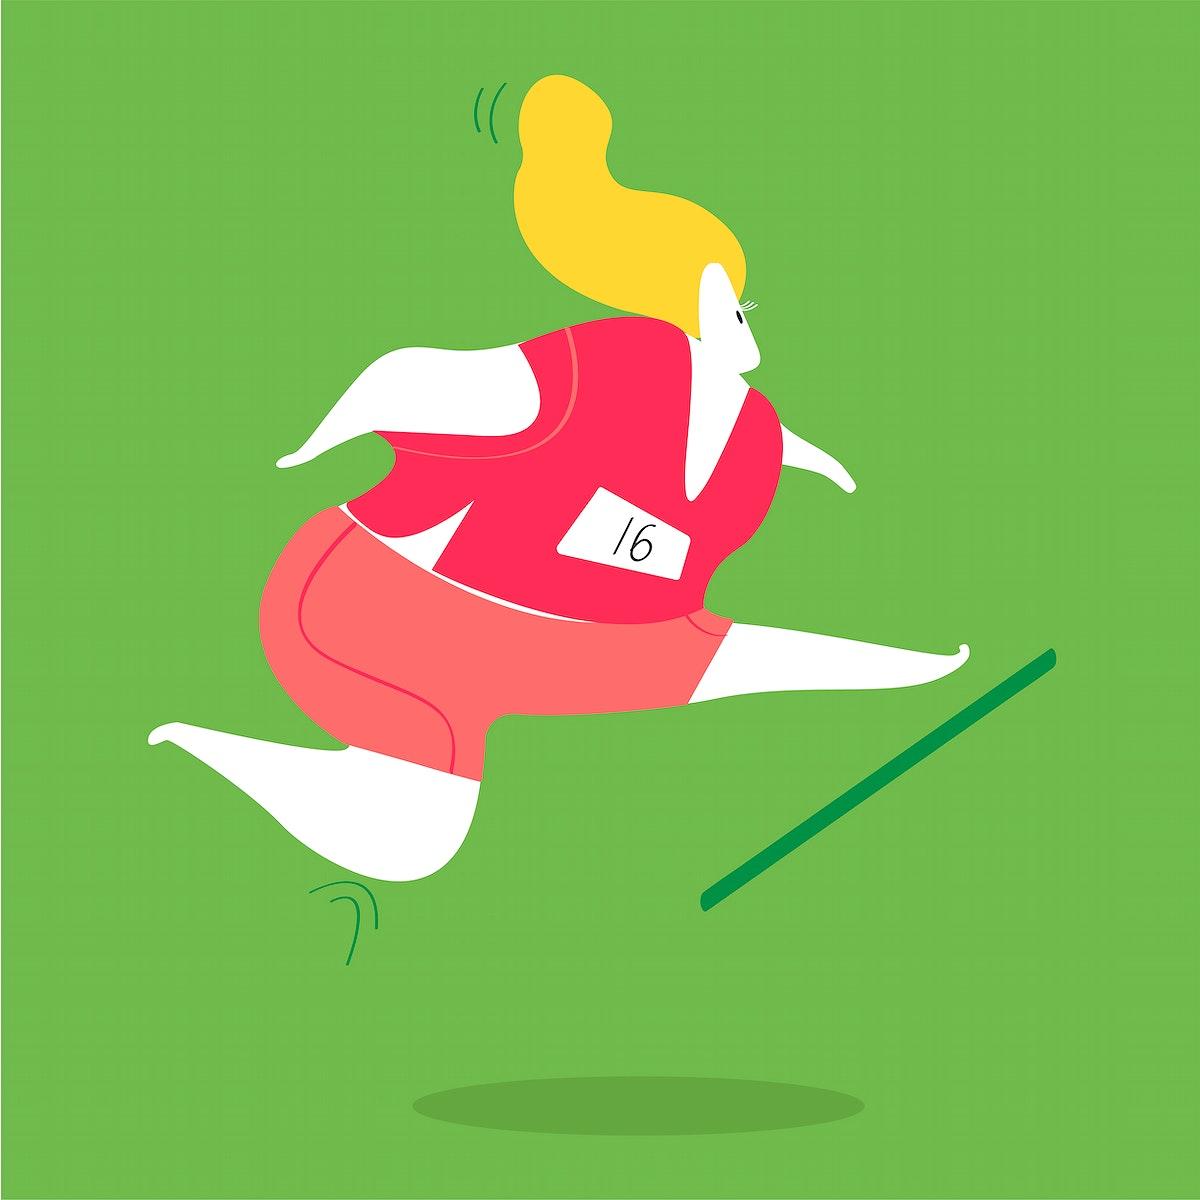 Female character running and jumping hurdles illustration